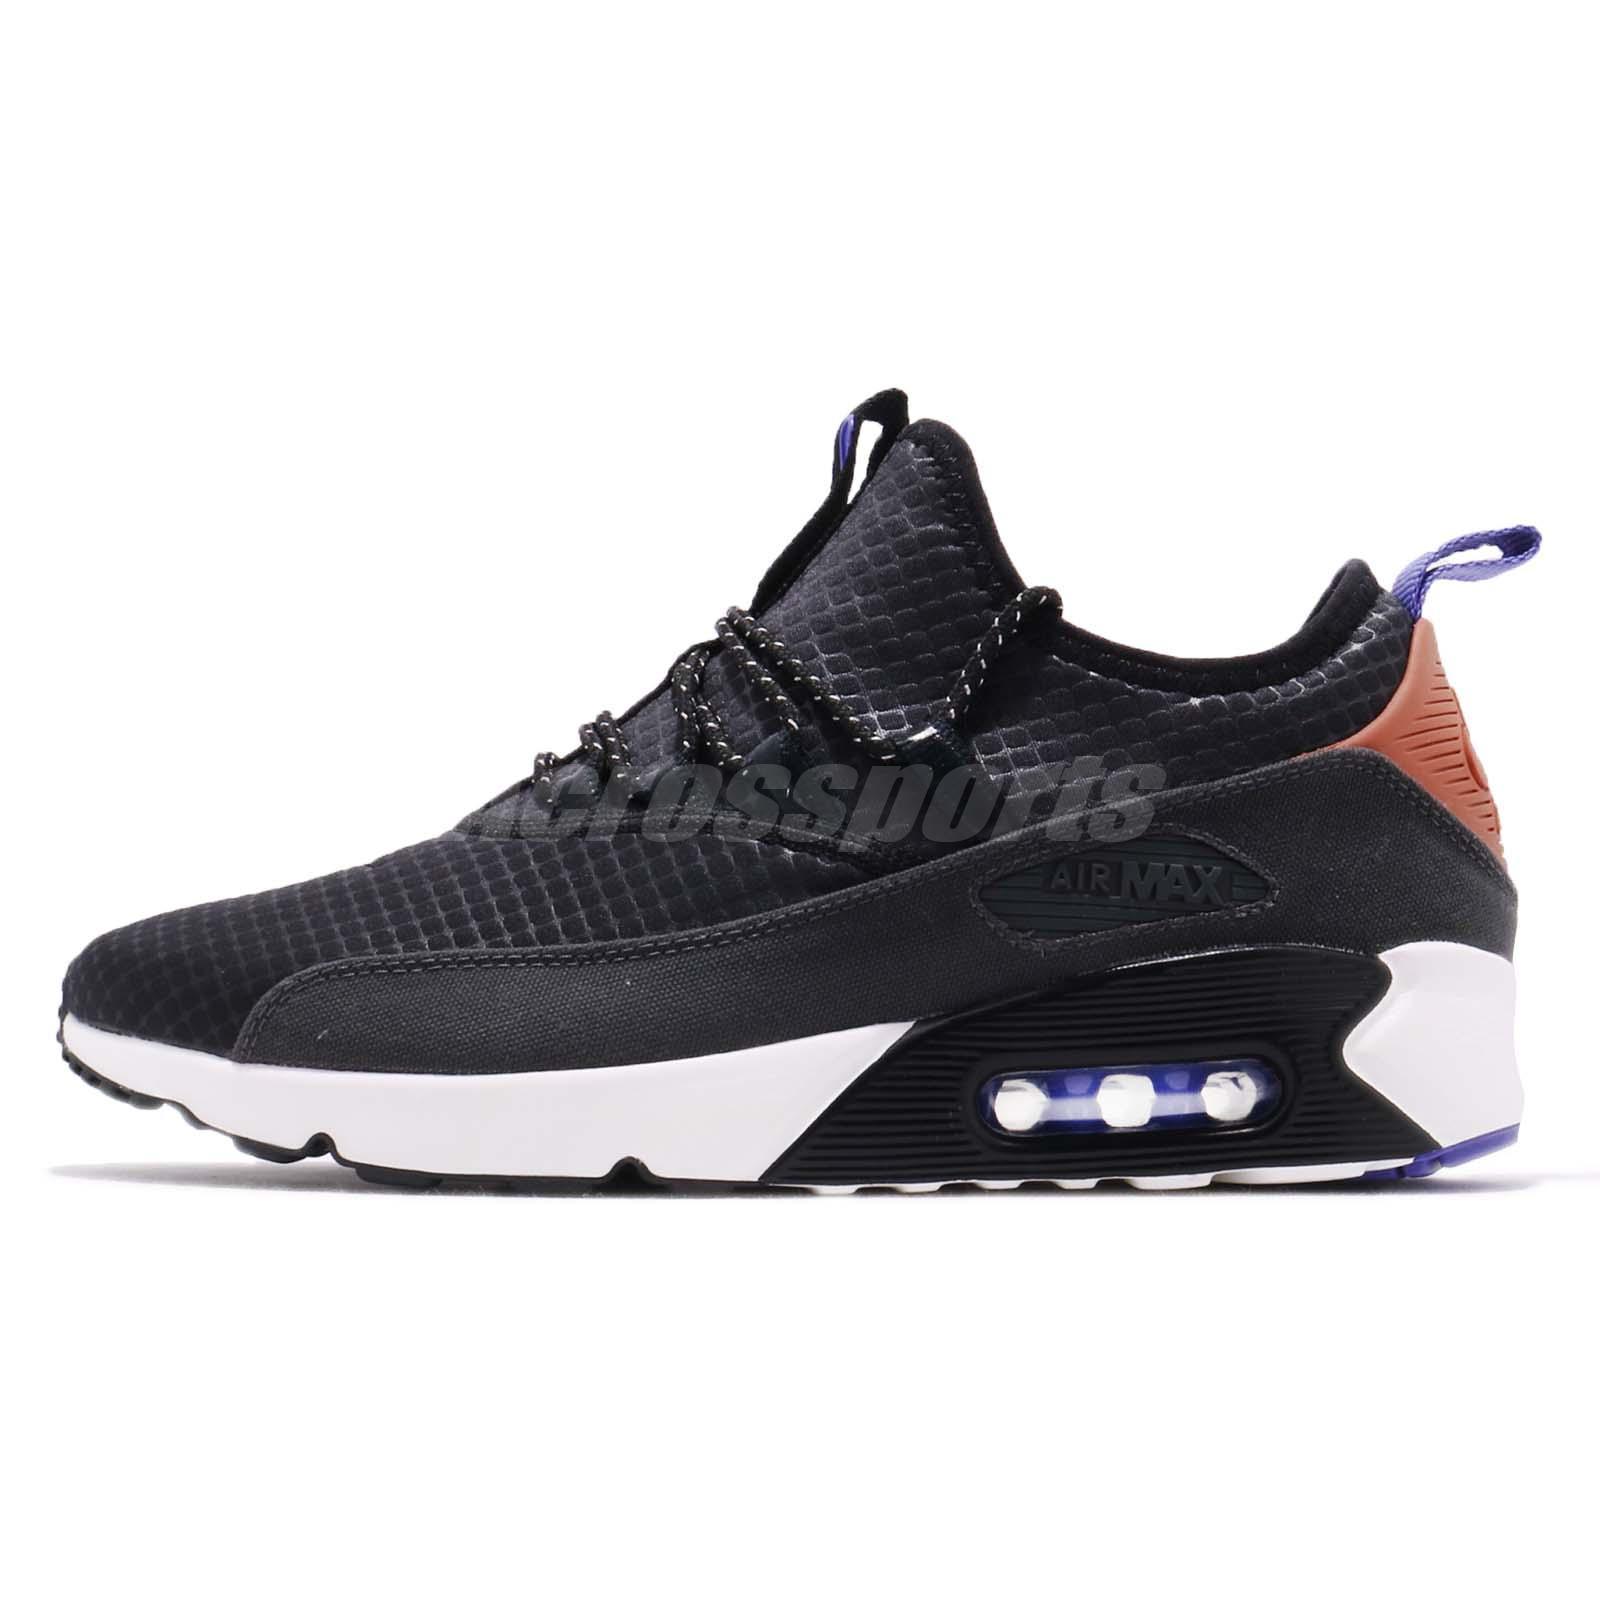 90 Dragon Max Black Shoe Zoom Purple Air Nike 2 Cage White vYtqg0 9a1de1fd7